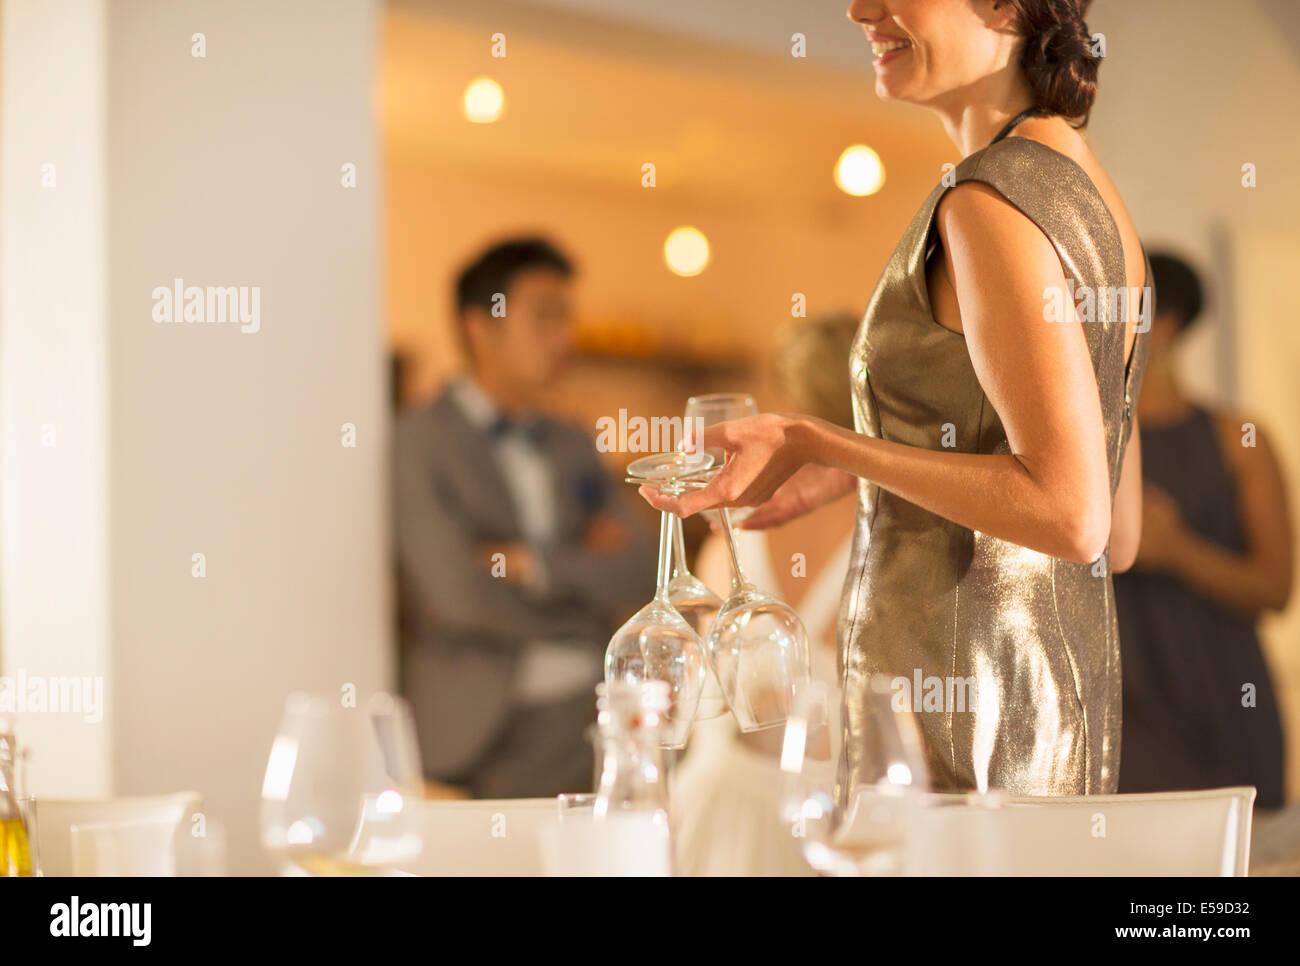 Frau Einstellung Tabelle bei Dinner-party Stockbild